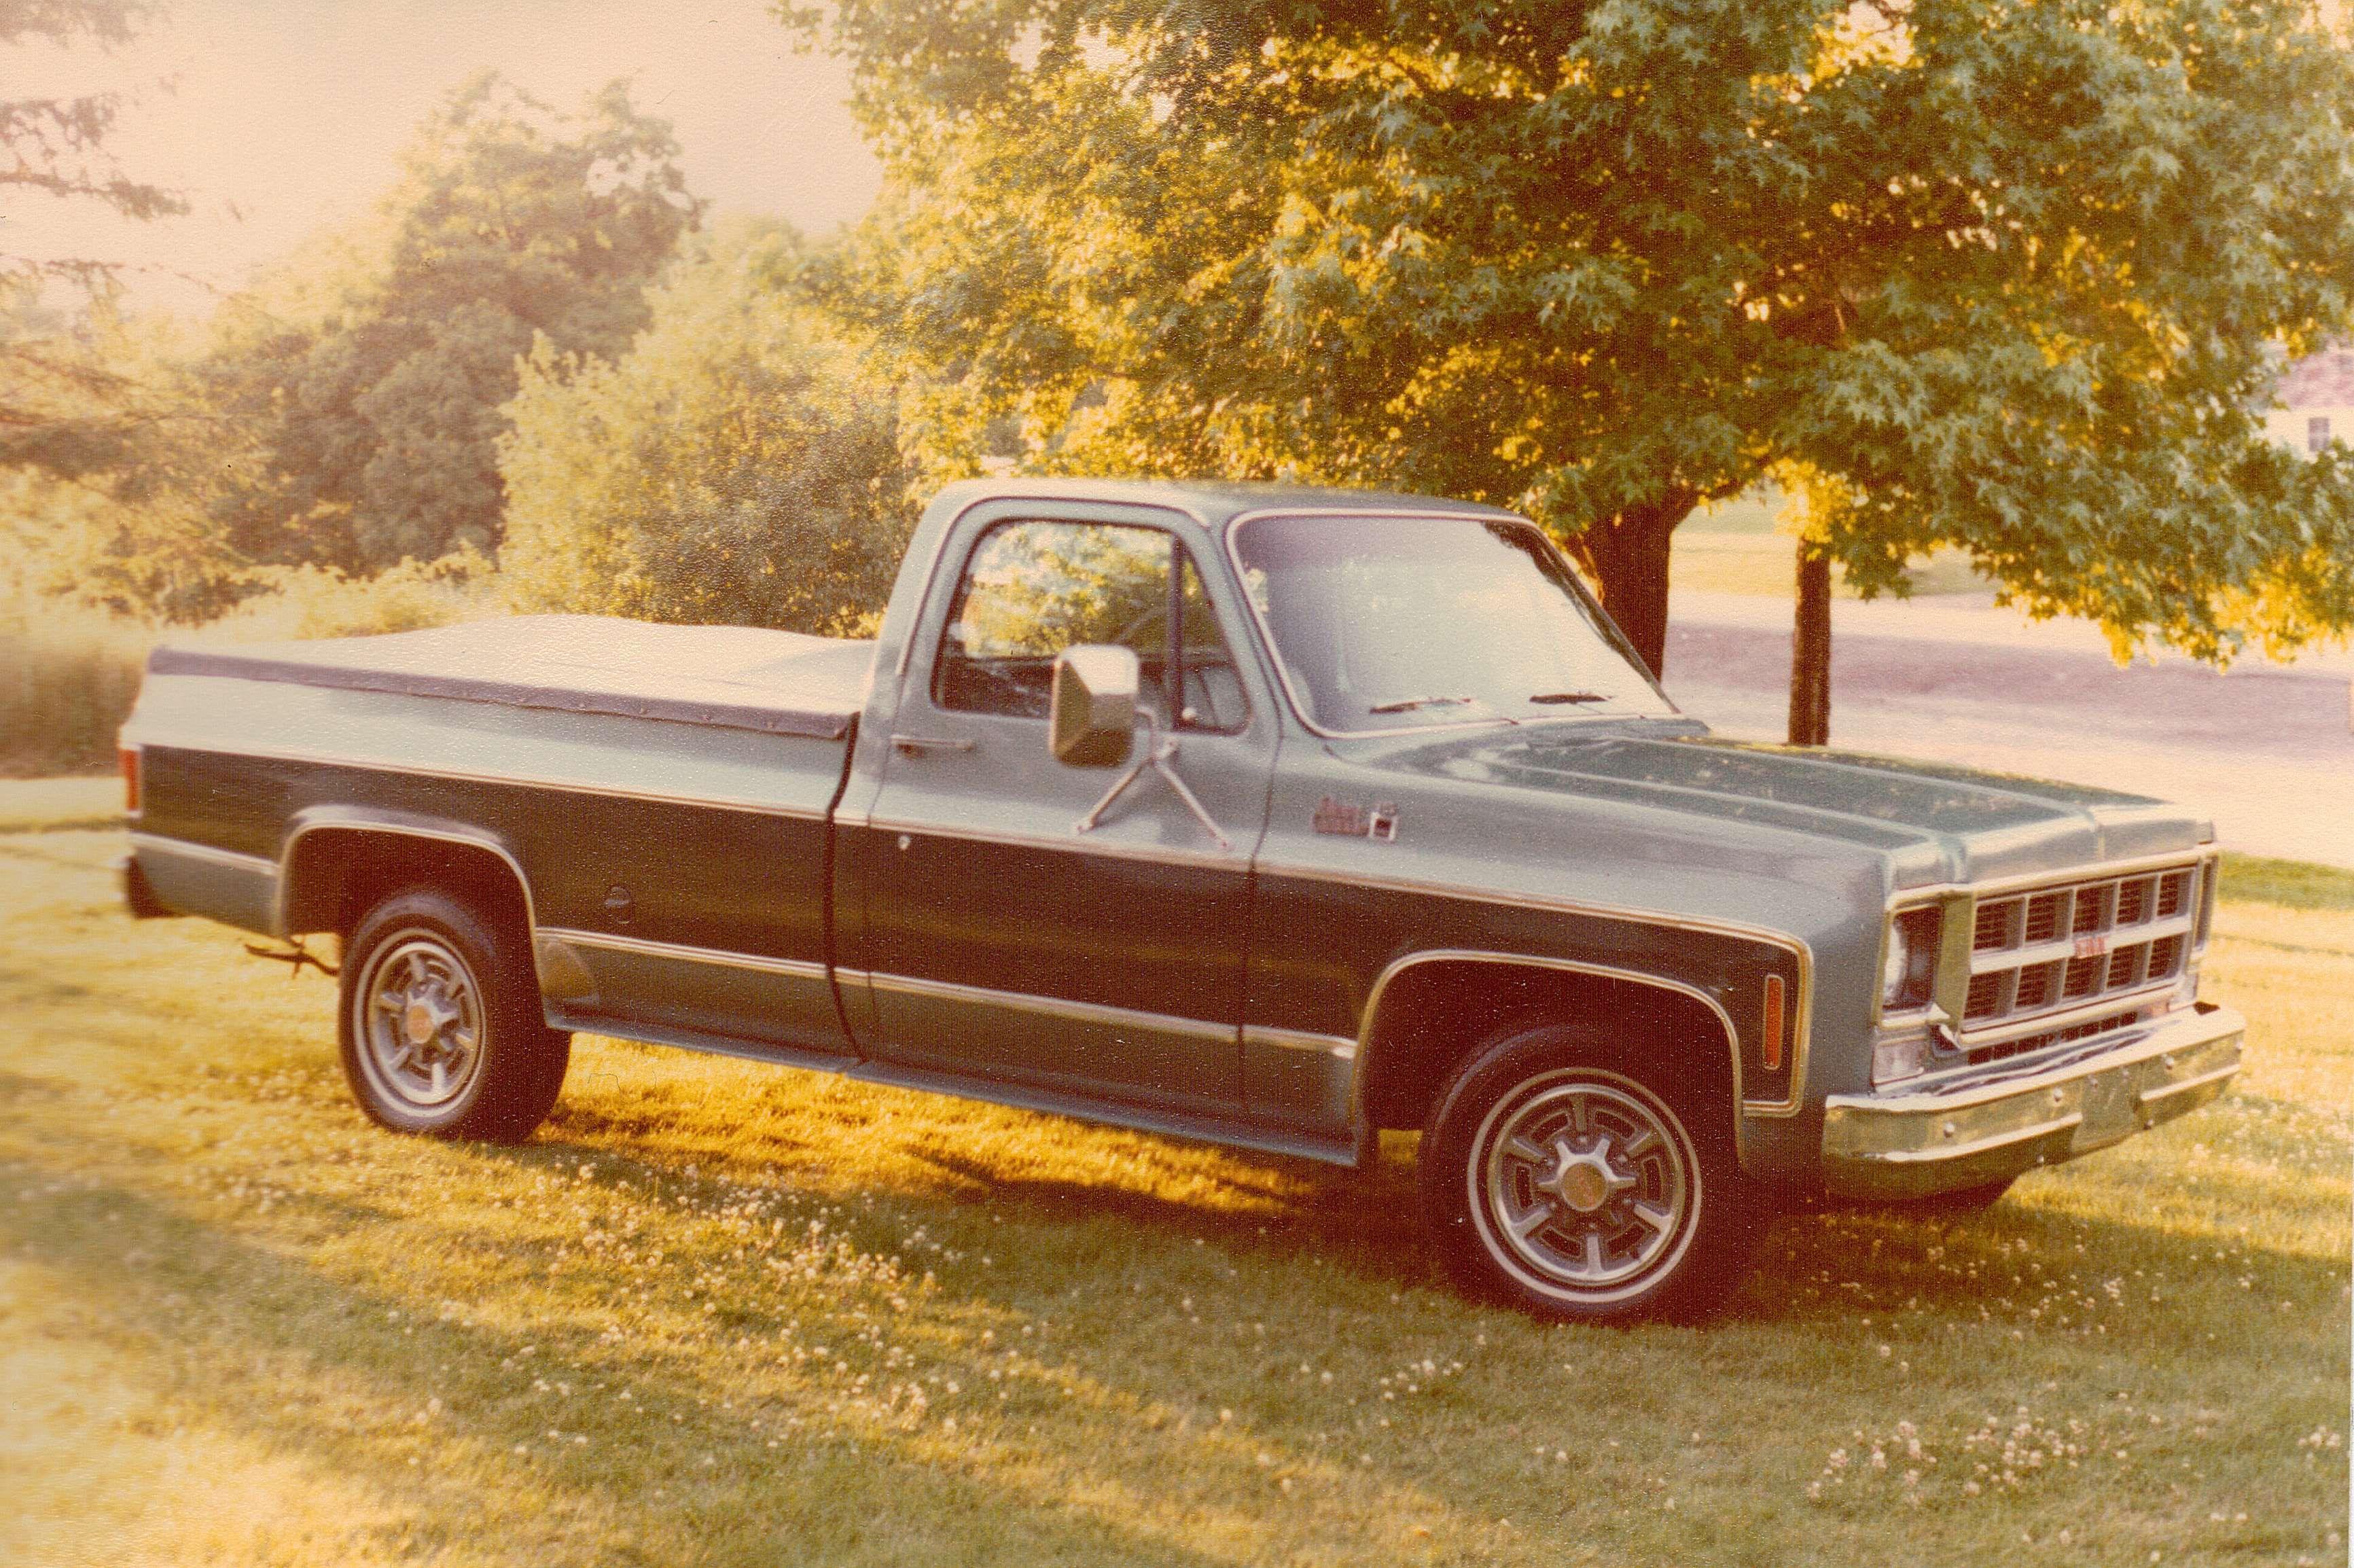 1977 Gmc C15 Sierra Gm Trucks Gmc Trucks Gmc